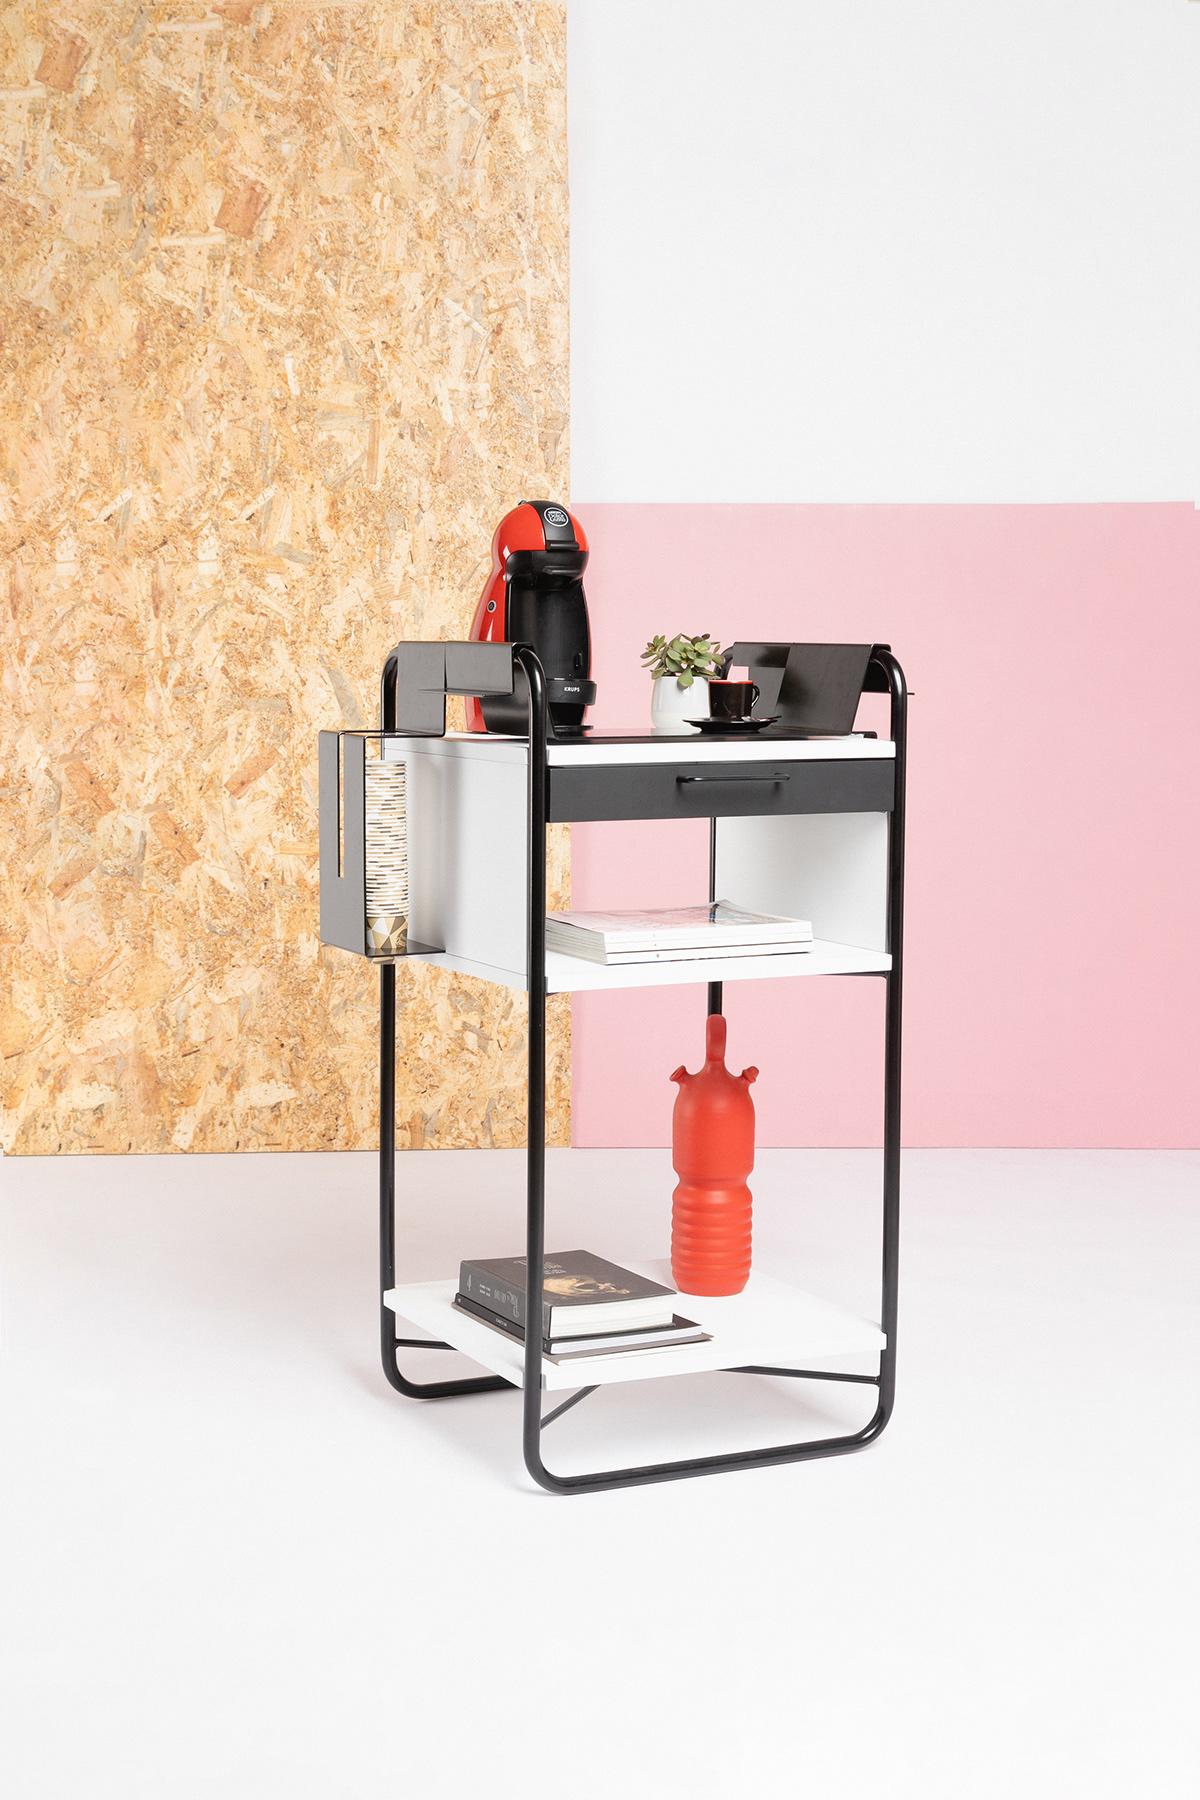 art direction creative smartworking product design Hub studio Office